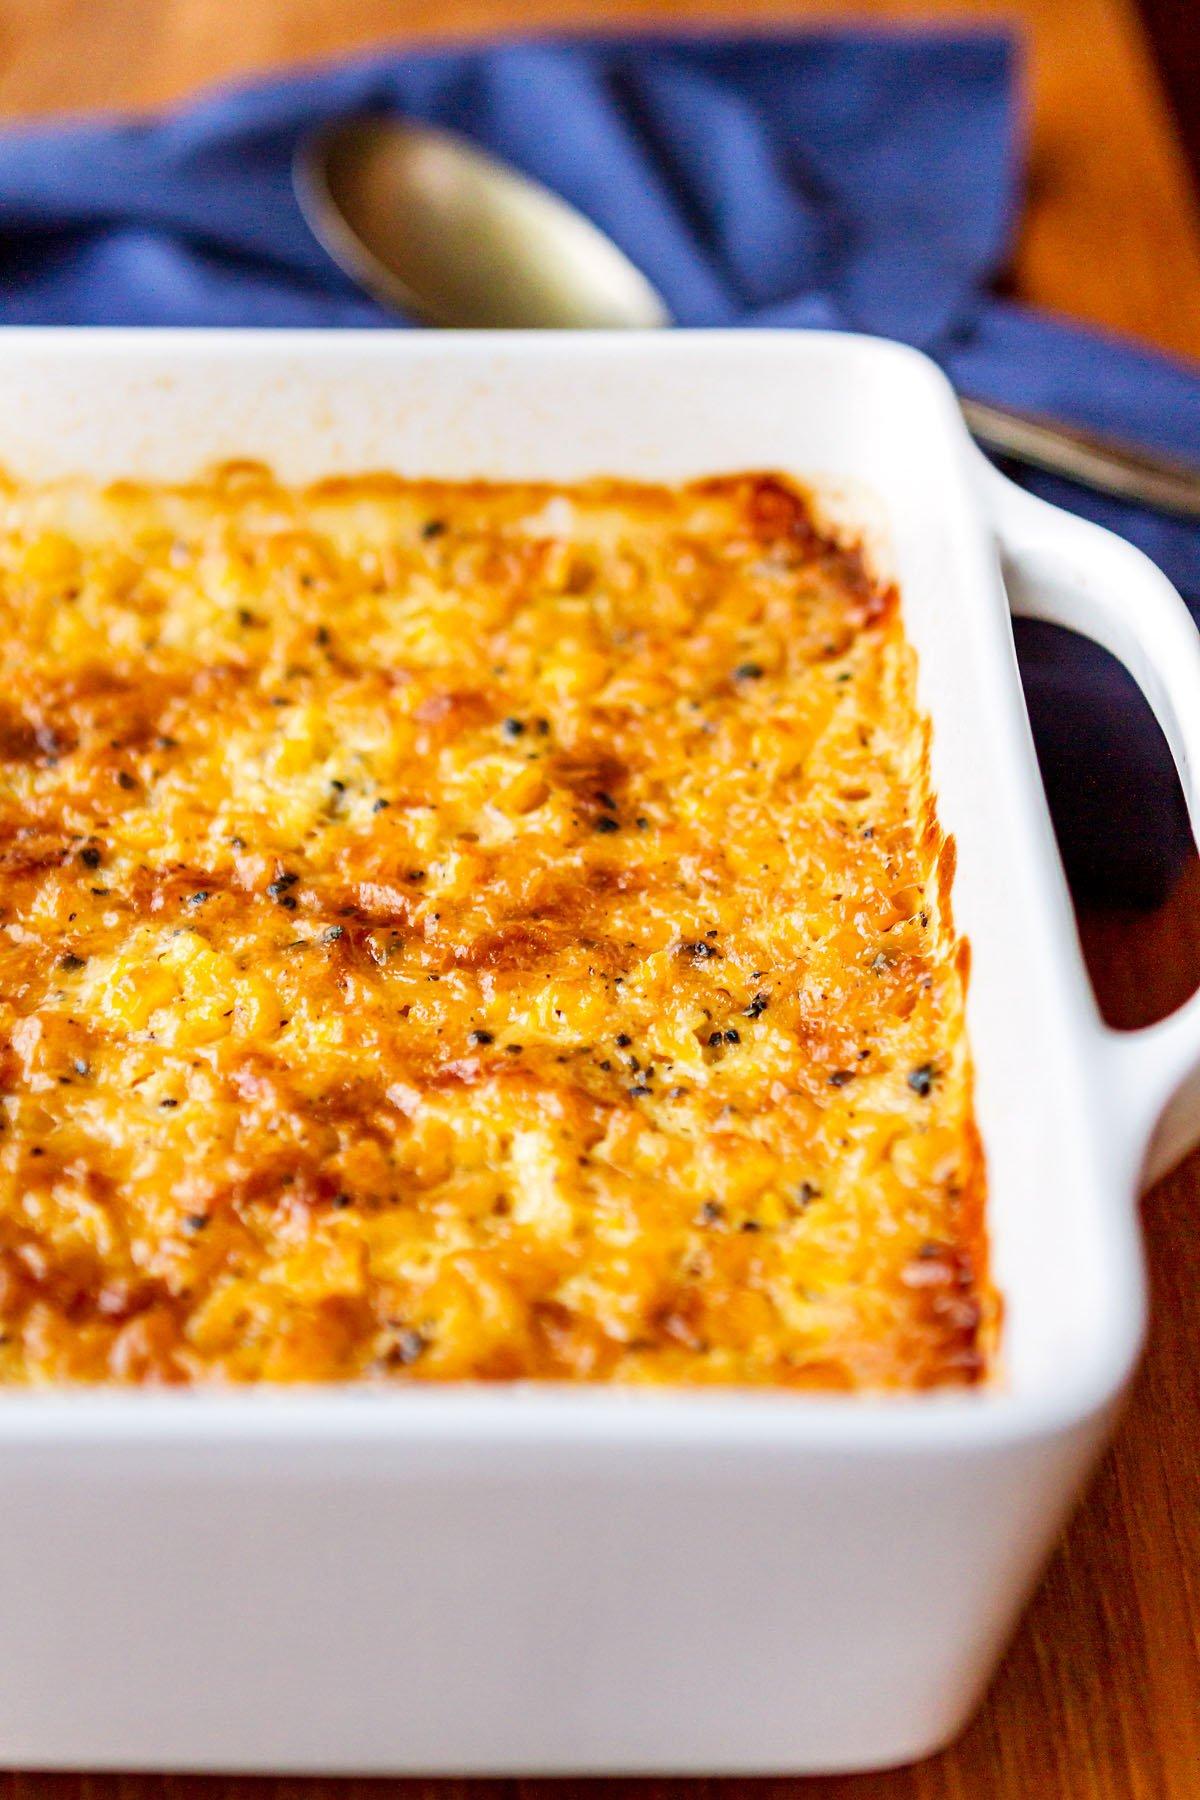 corn casserole like grandma made it in a white casserole dish with royal blue napkin